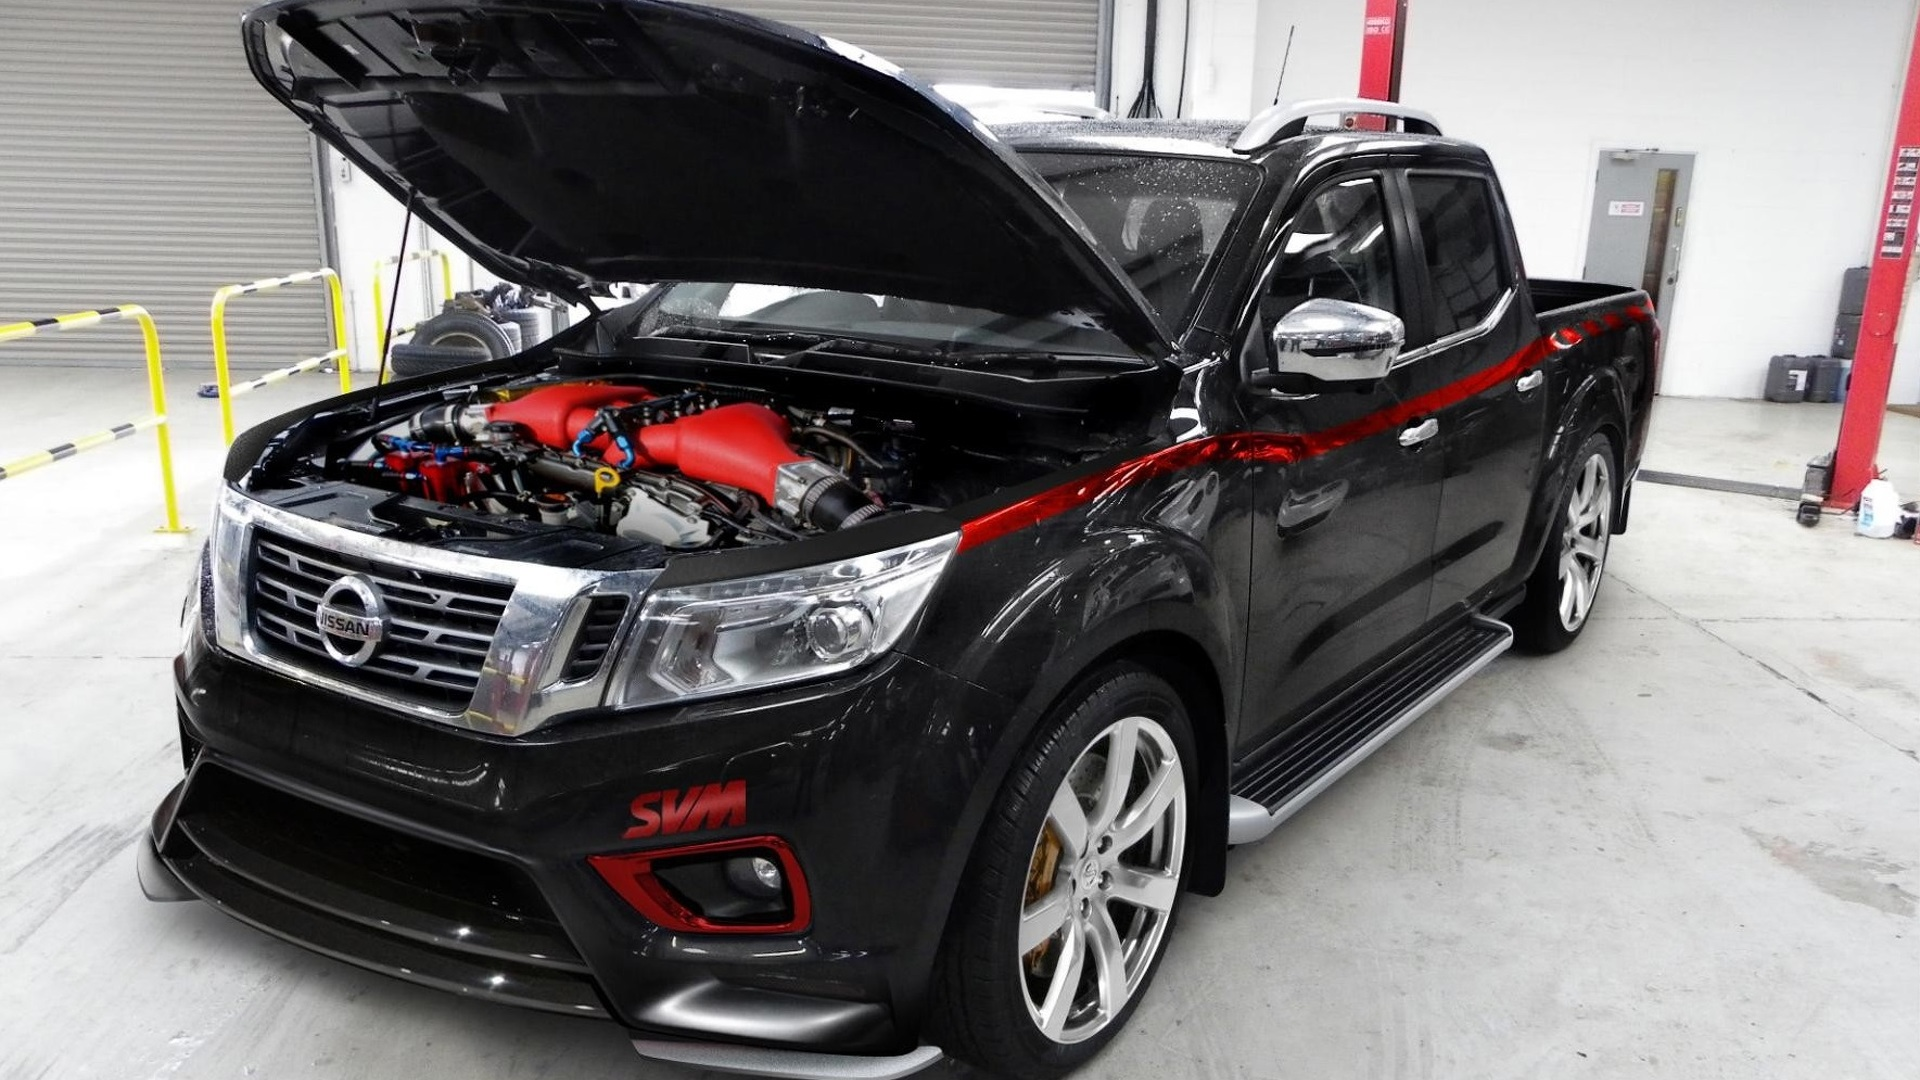 800-hp Nissan Navara has GT-R engine, upgradeable to 1,500 hp